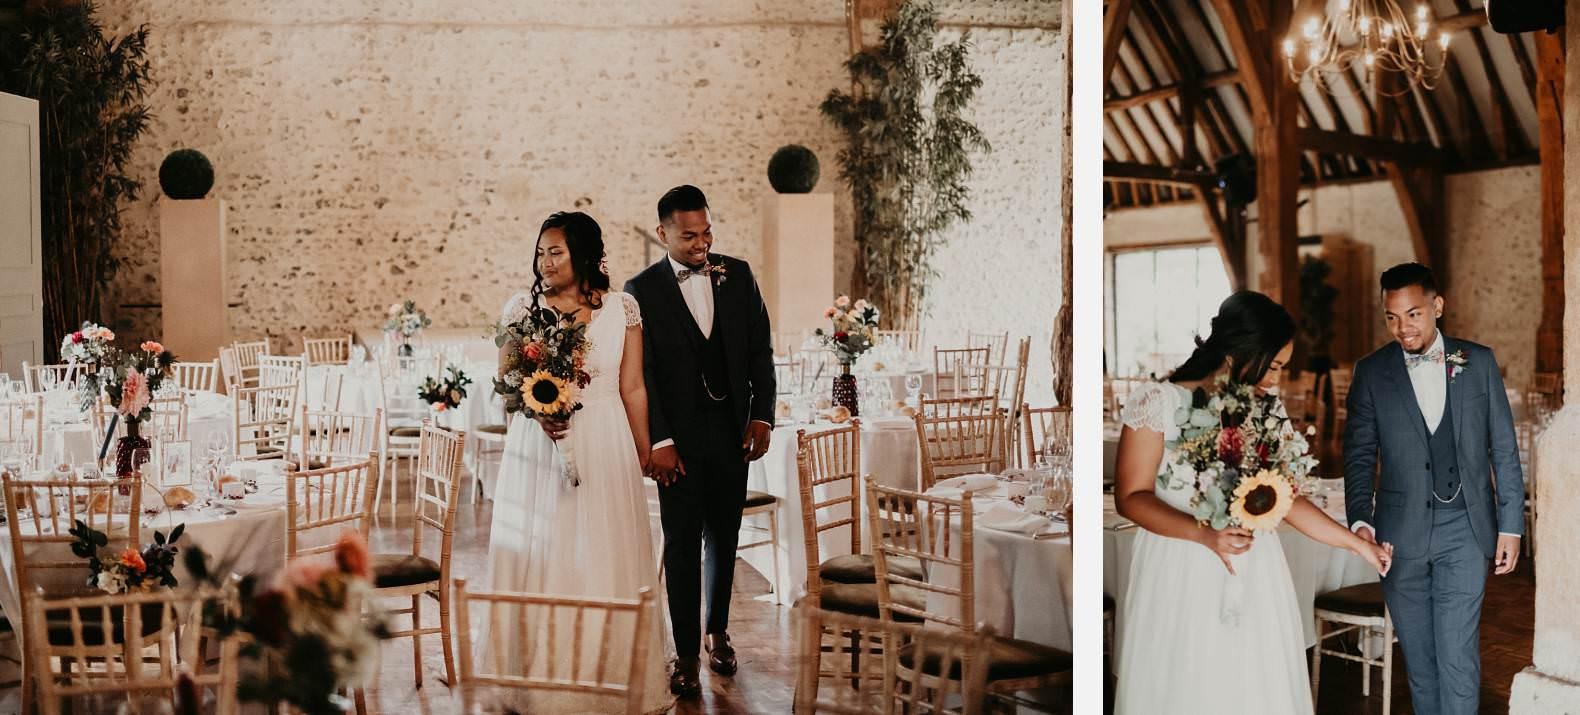 mariage manoir de corny photographe bel esprit 0043 1